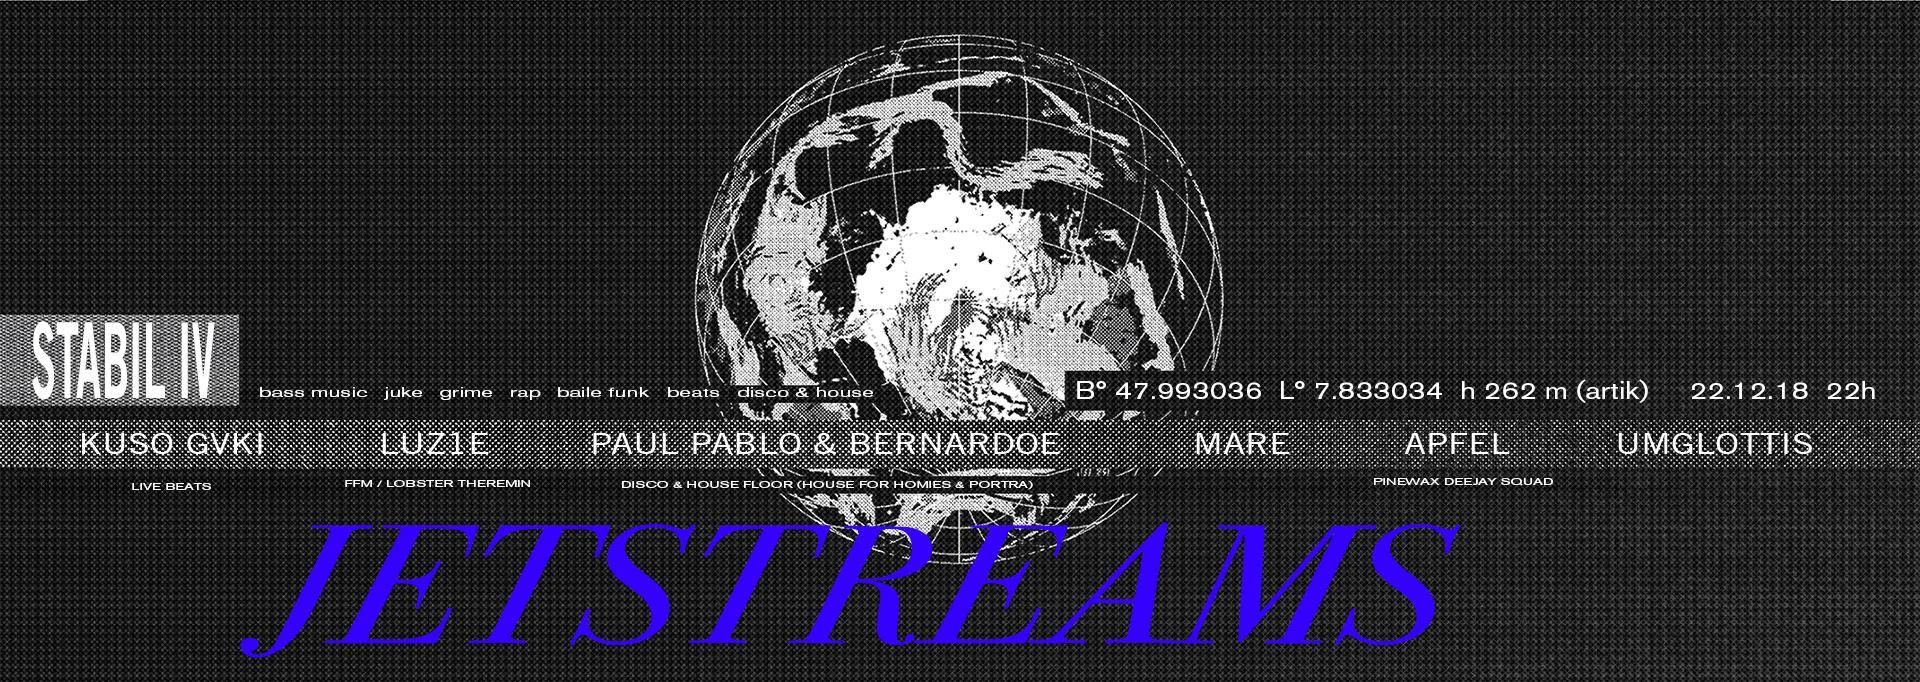 Stabil 4: Jetstreams (Special Guest: LUZ1E) || 22.12.18